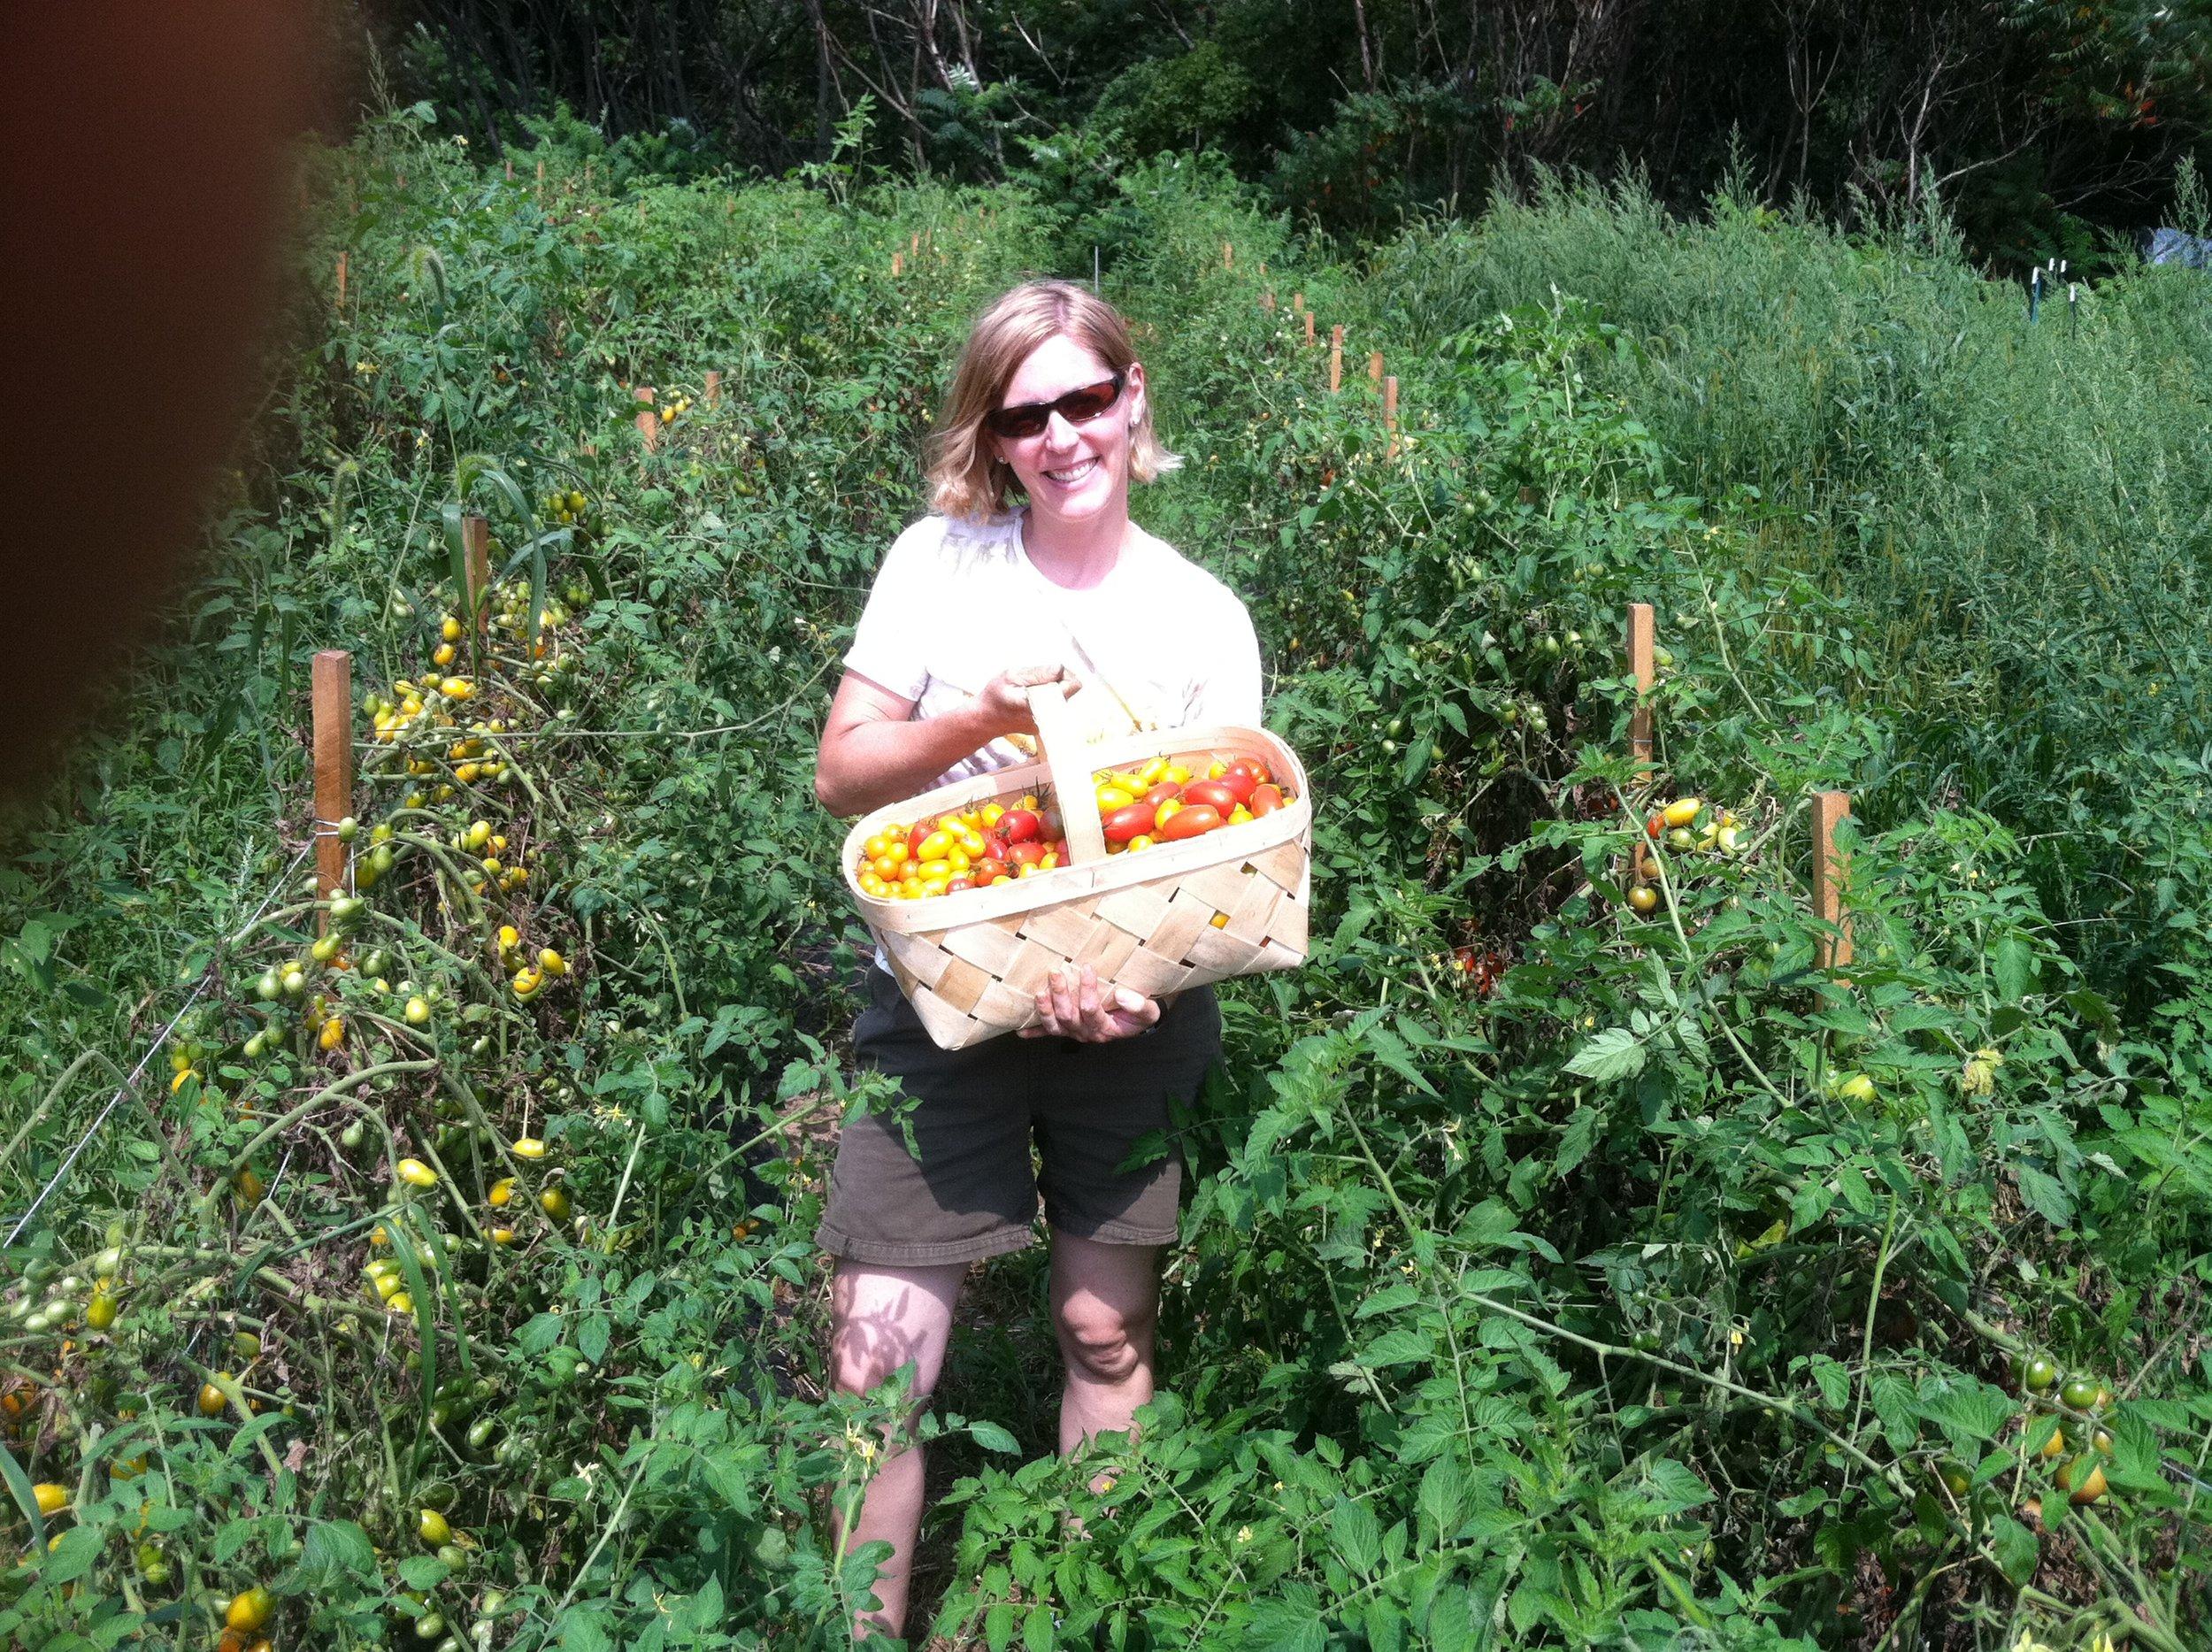 Jen harvesting tasty cherry tomatoes!